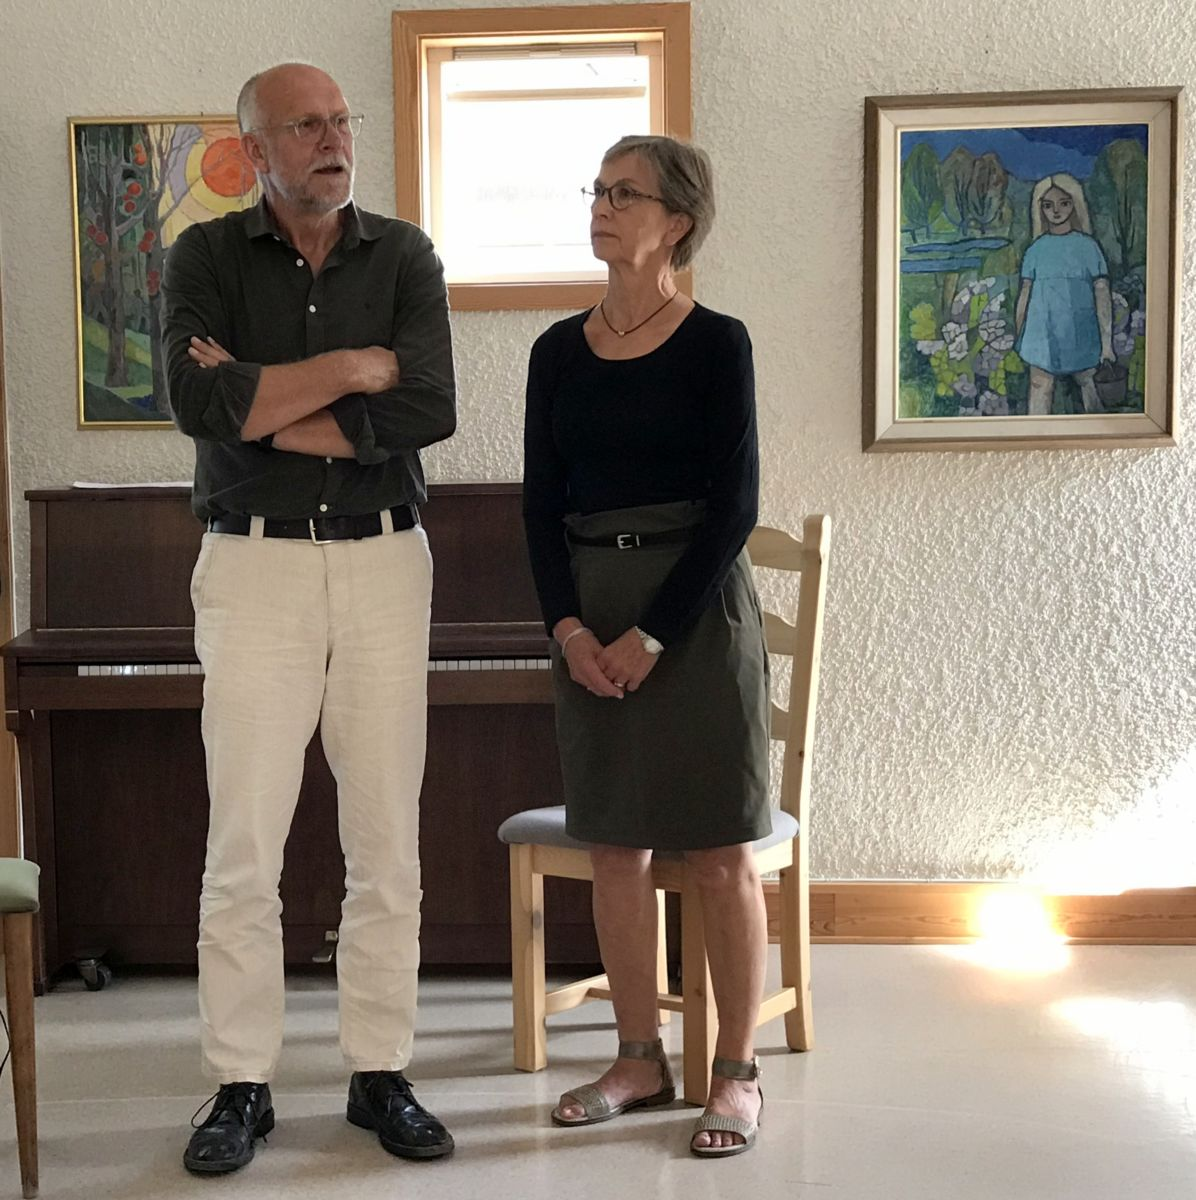 Odd Ingar Skrøvseth og Gjertrud Hals Skrøvseth i Kallastuå. Foto: Dordi J H